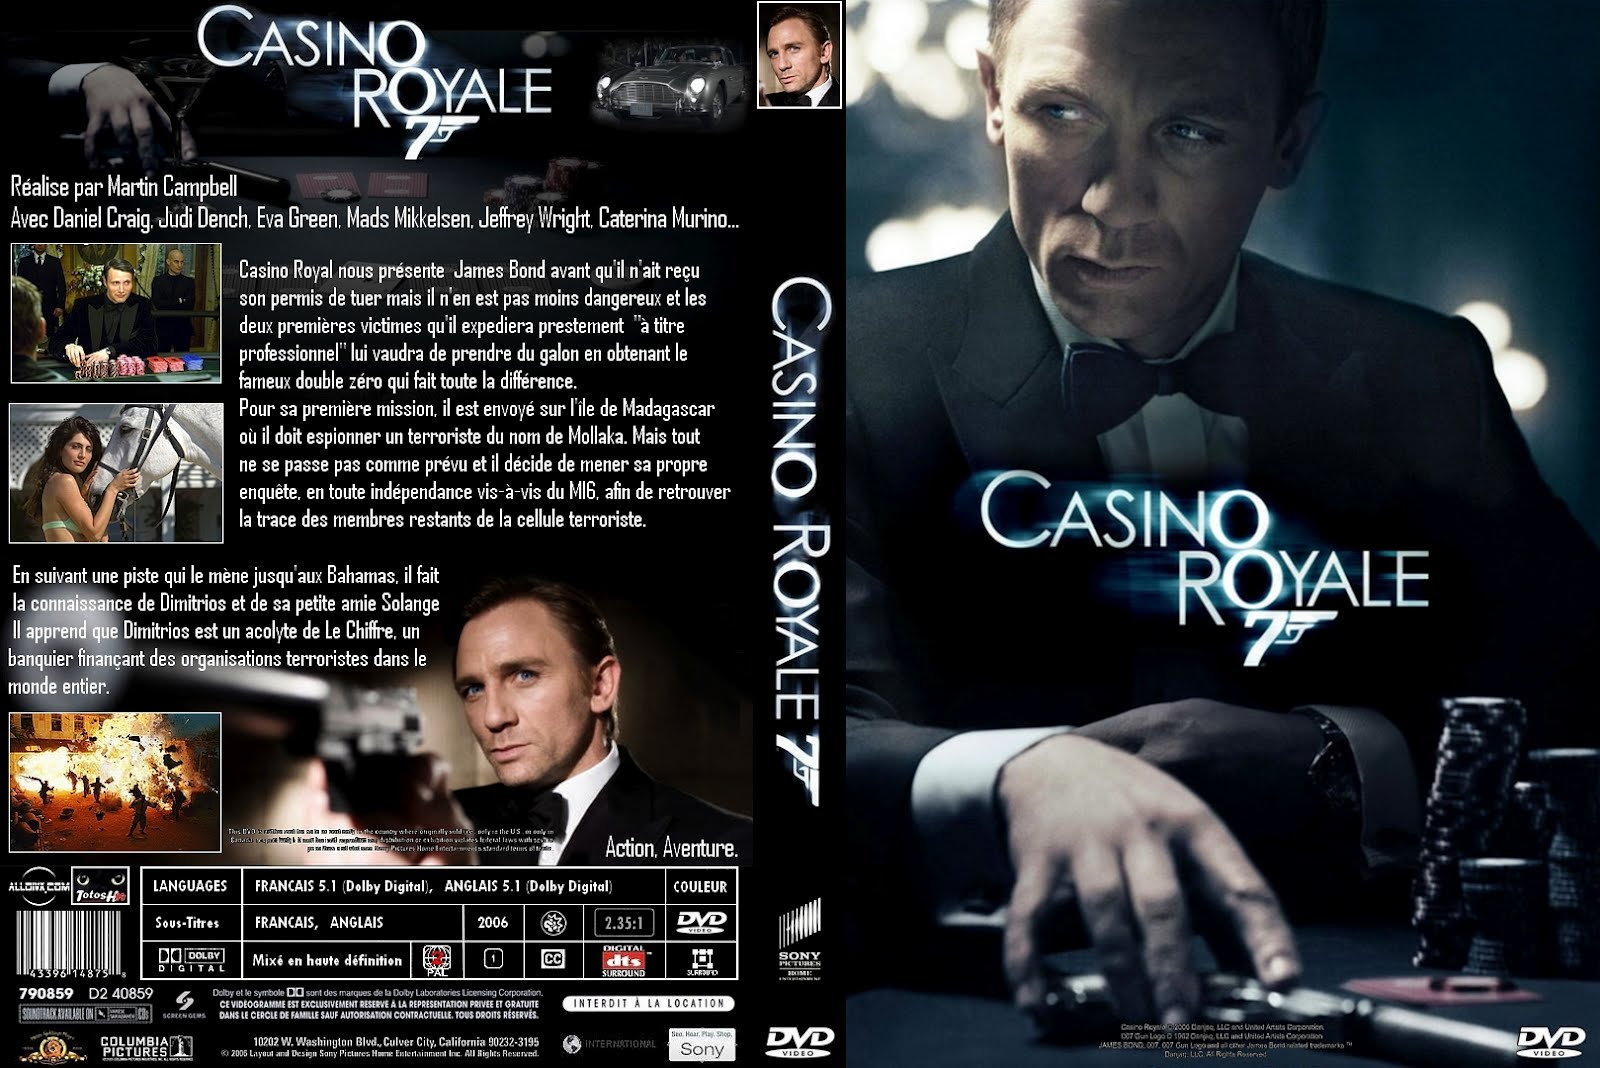 Film 007 casino royale